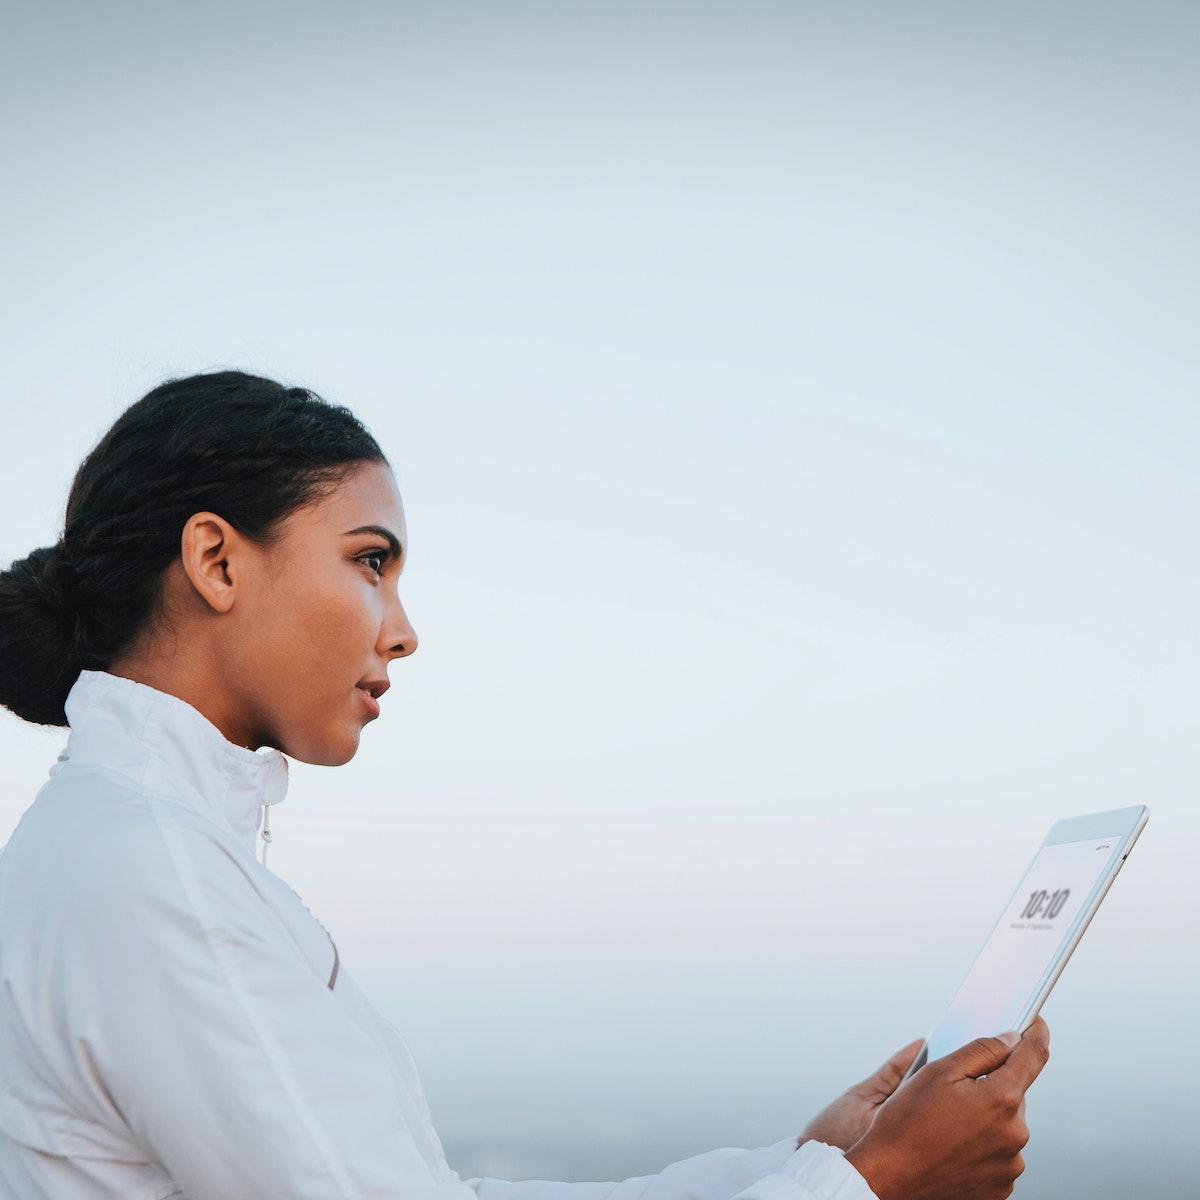 Woman looking at her digital tablet